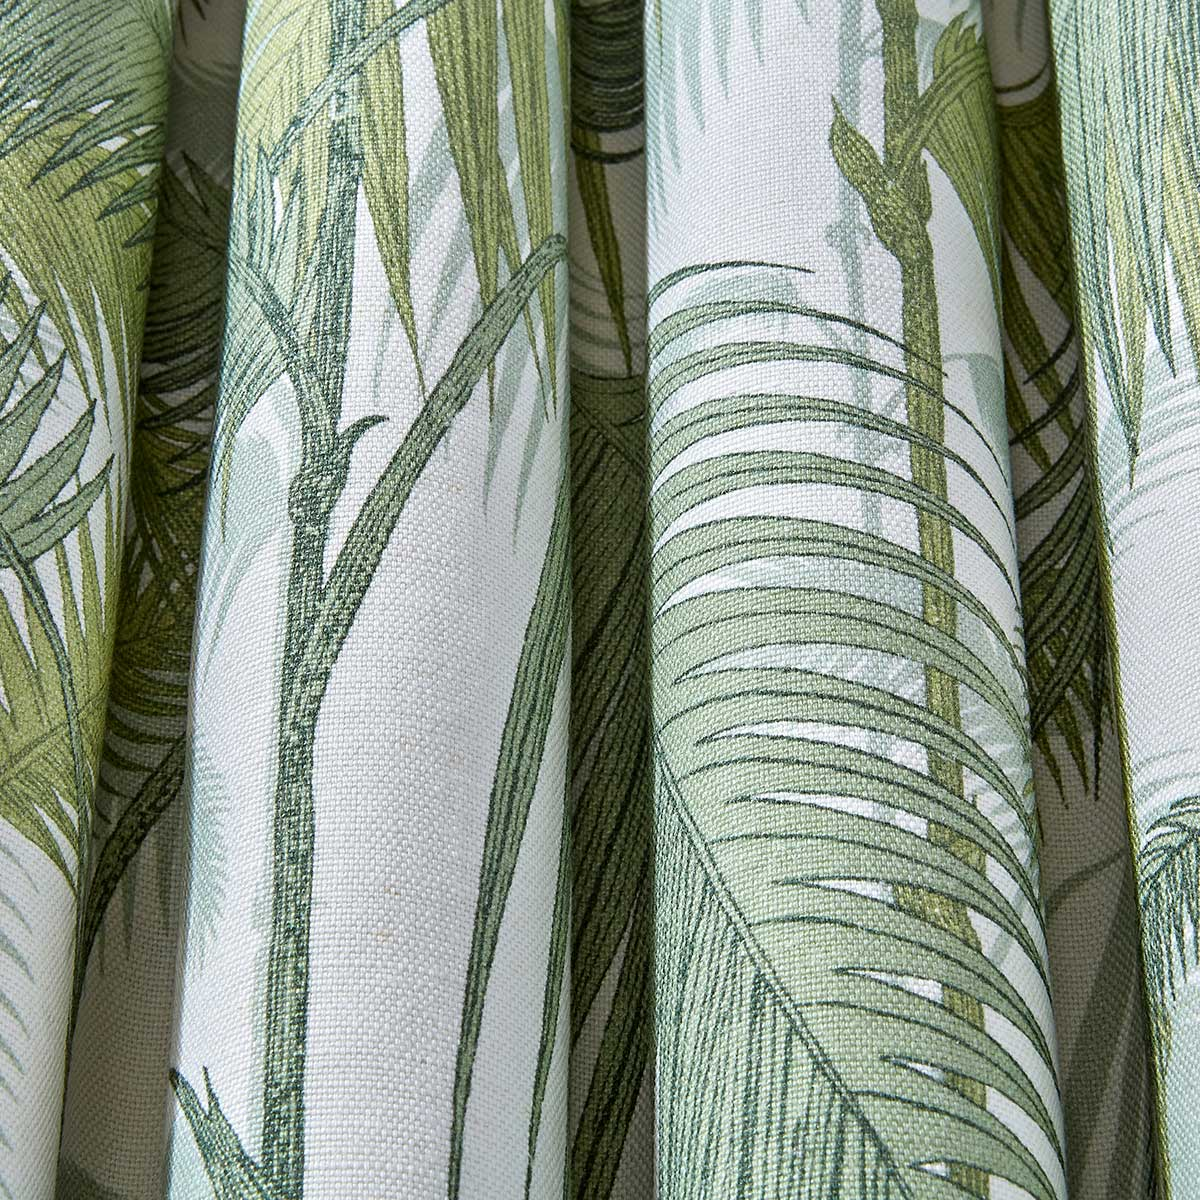 Cole & Son Palm Jungle Leaf Green / Olive Fabric - Product code: F111/2007LU